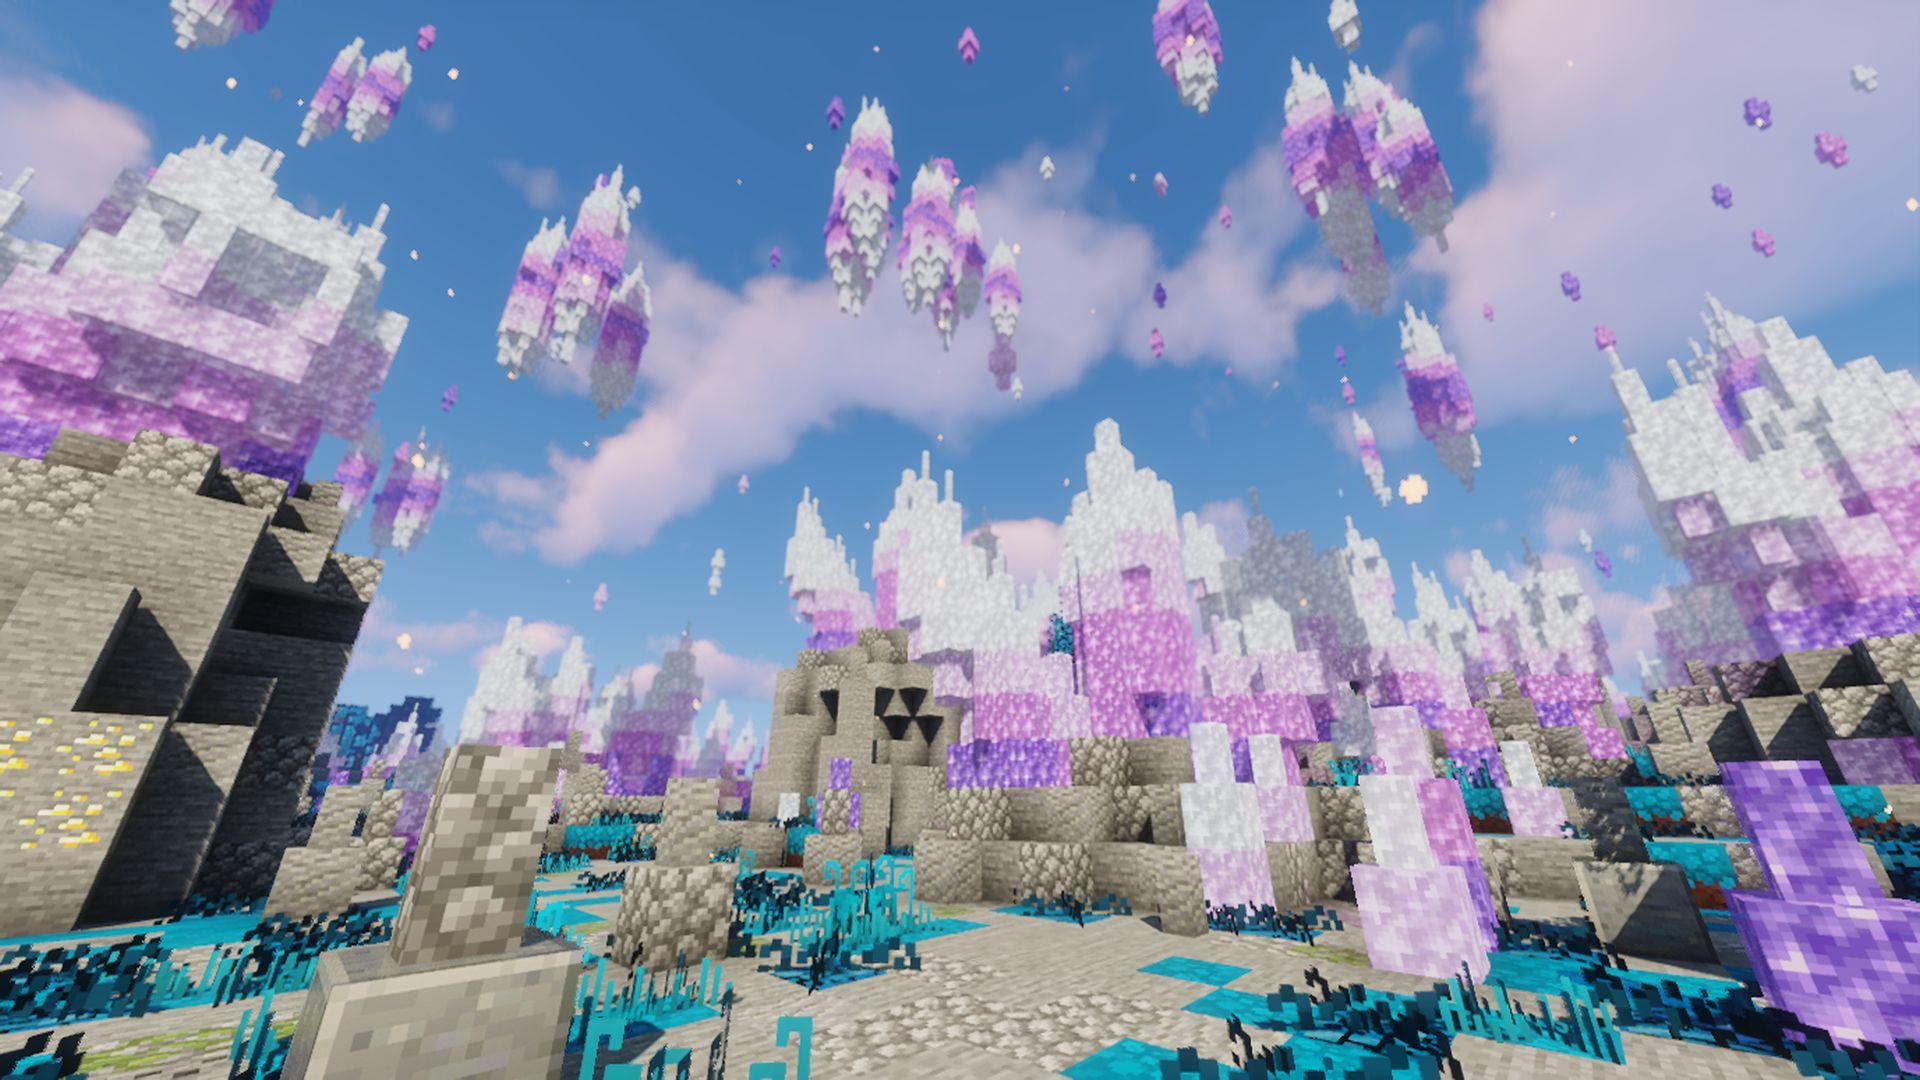 Minecraft modder shares updates on big steampunk project Hal's Exploration mod